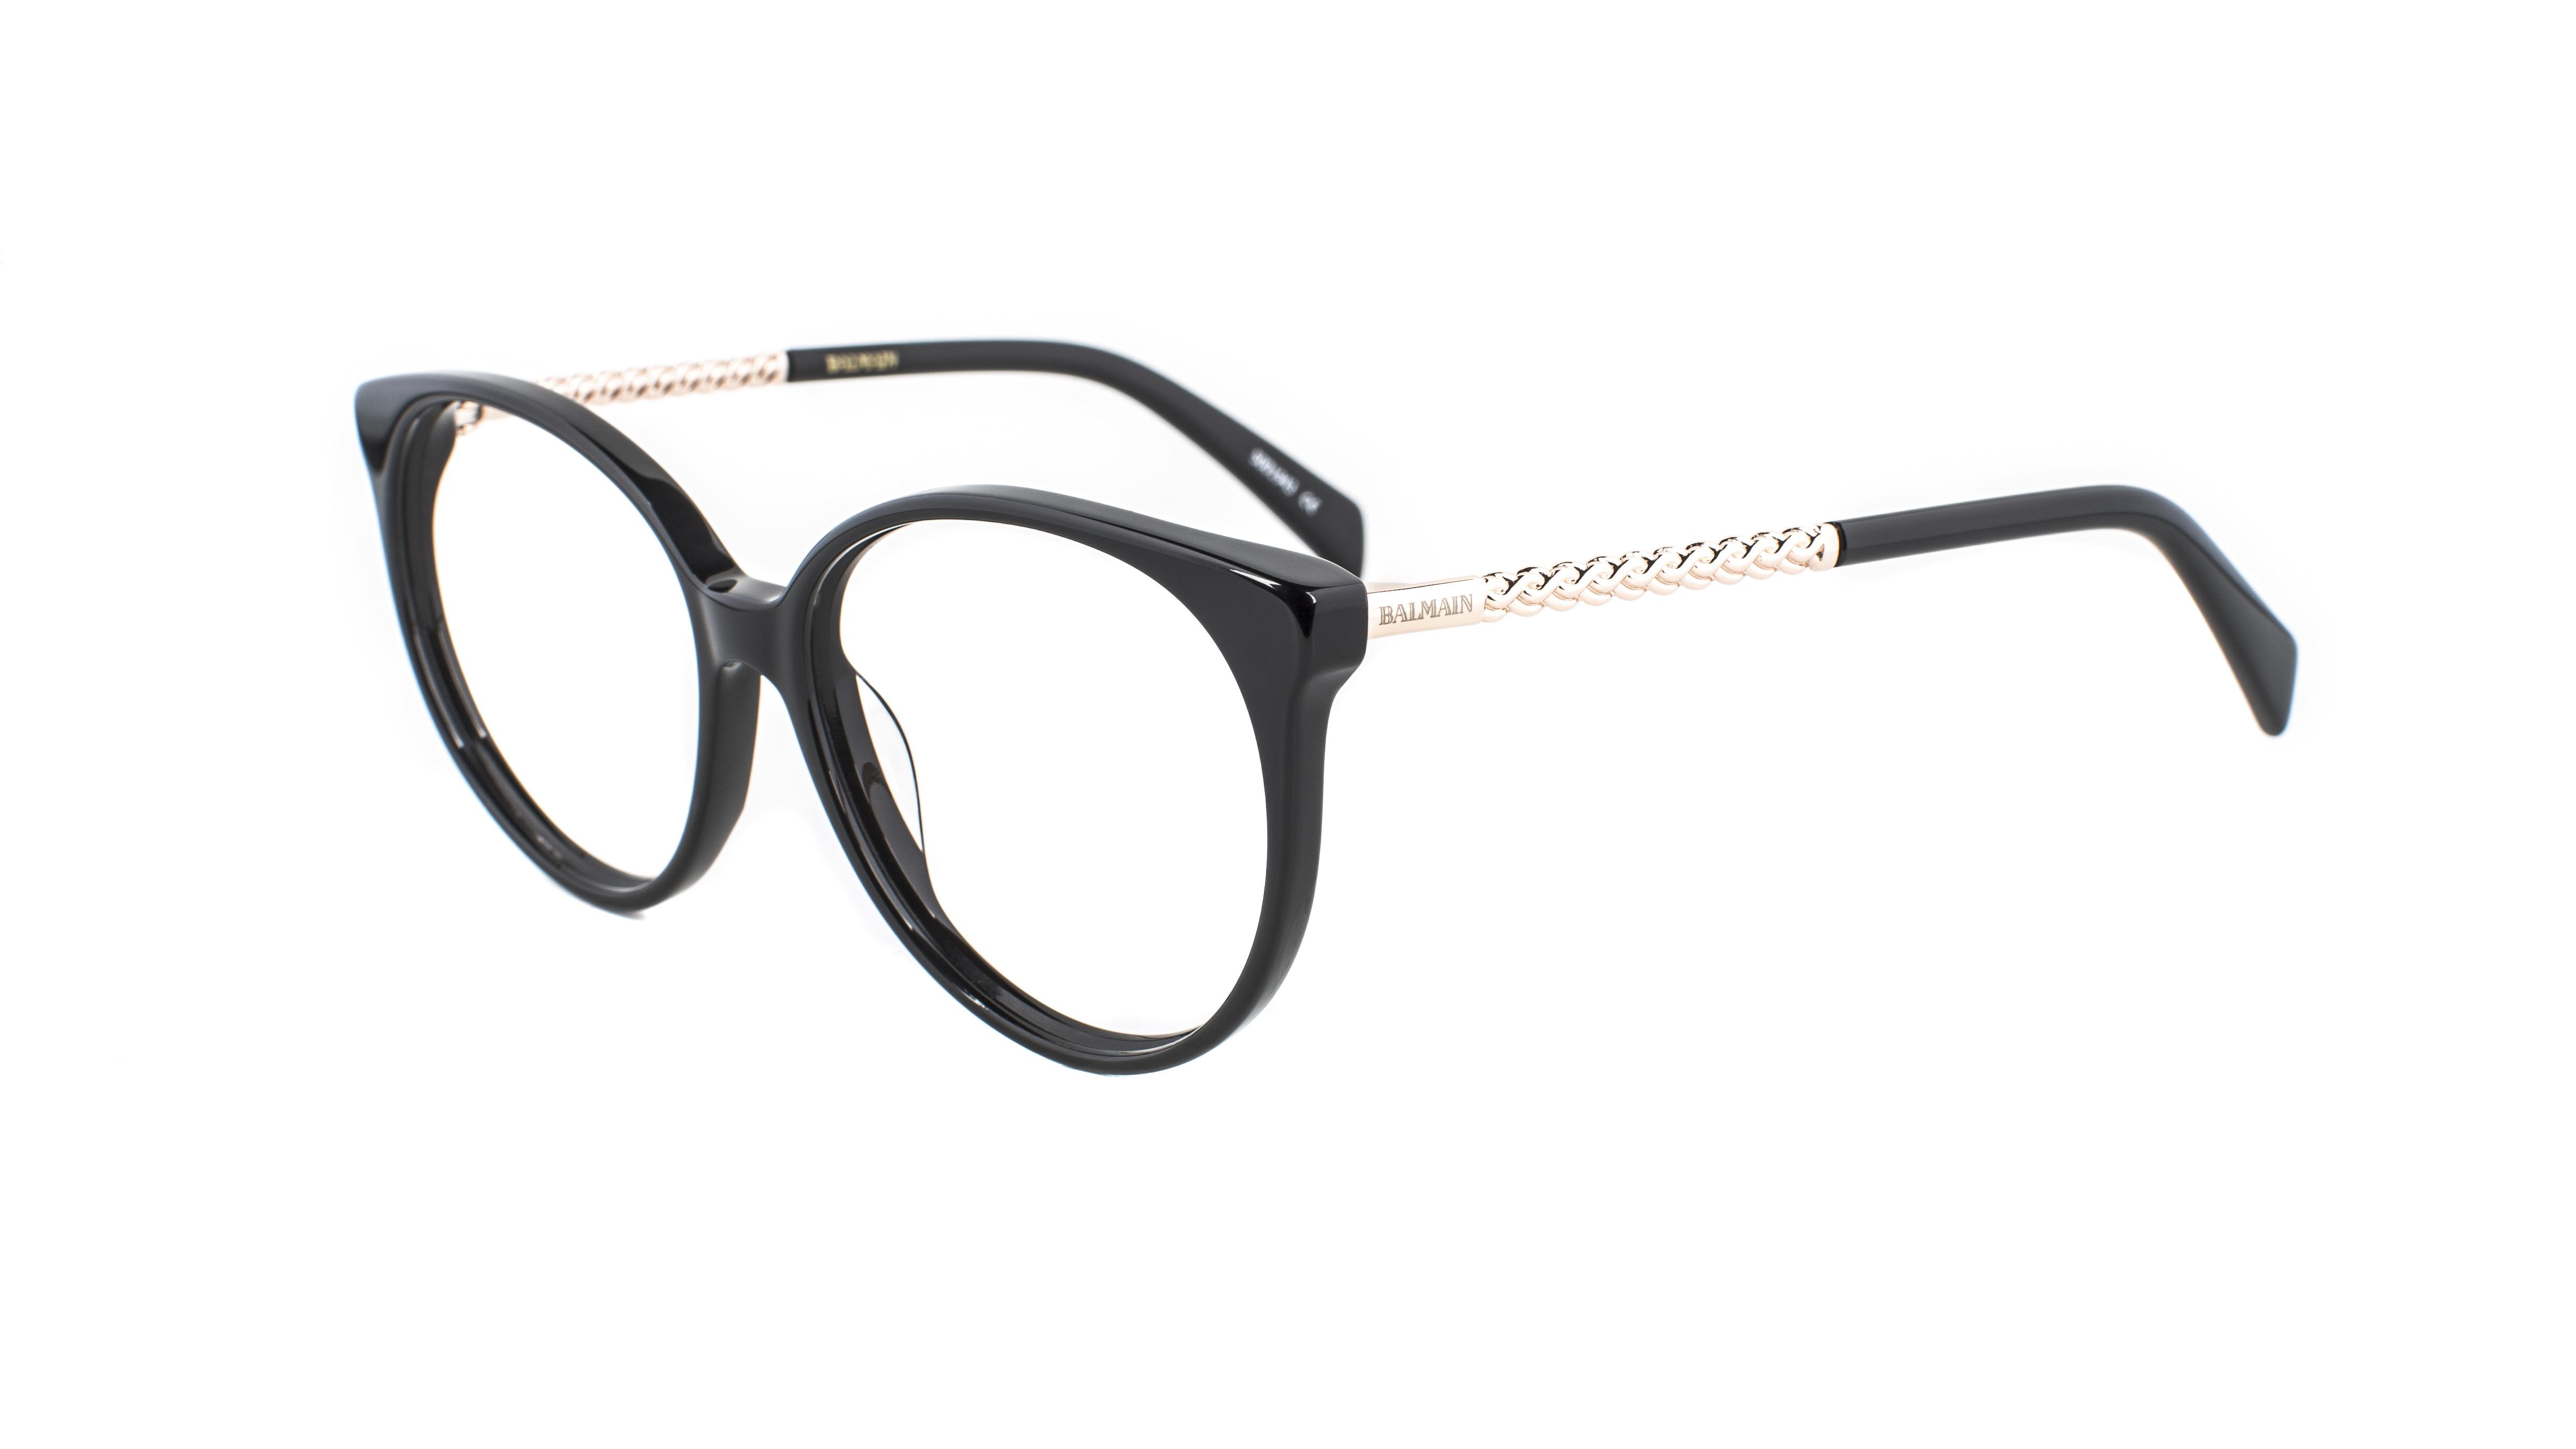 Balmain x Specsavers BL1509S 30570689 - RRP 2 pairs single vision $459